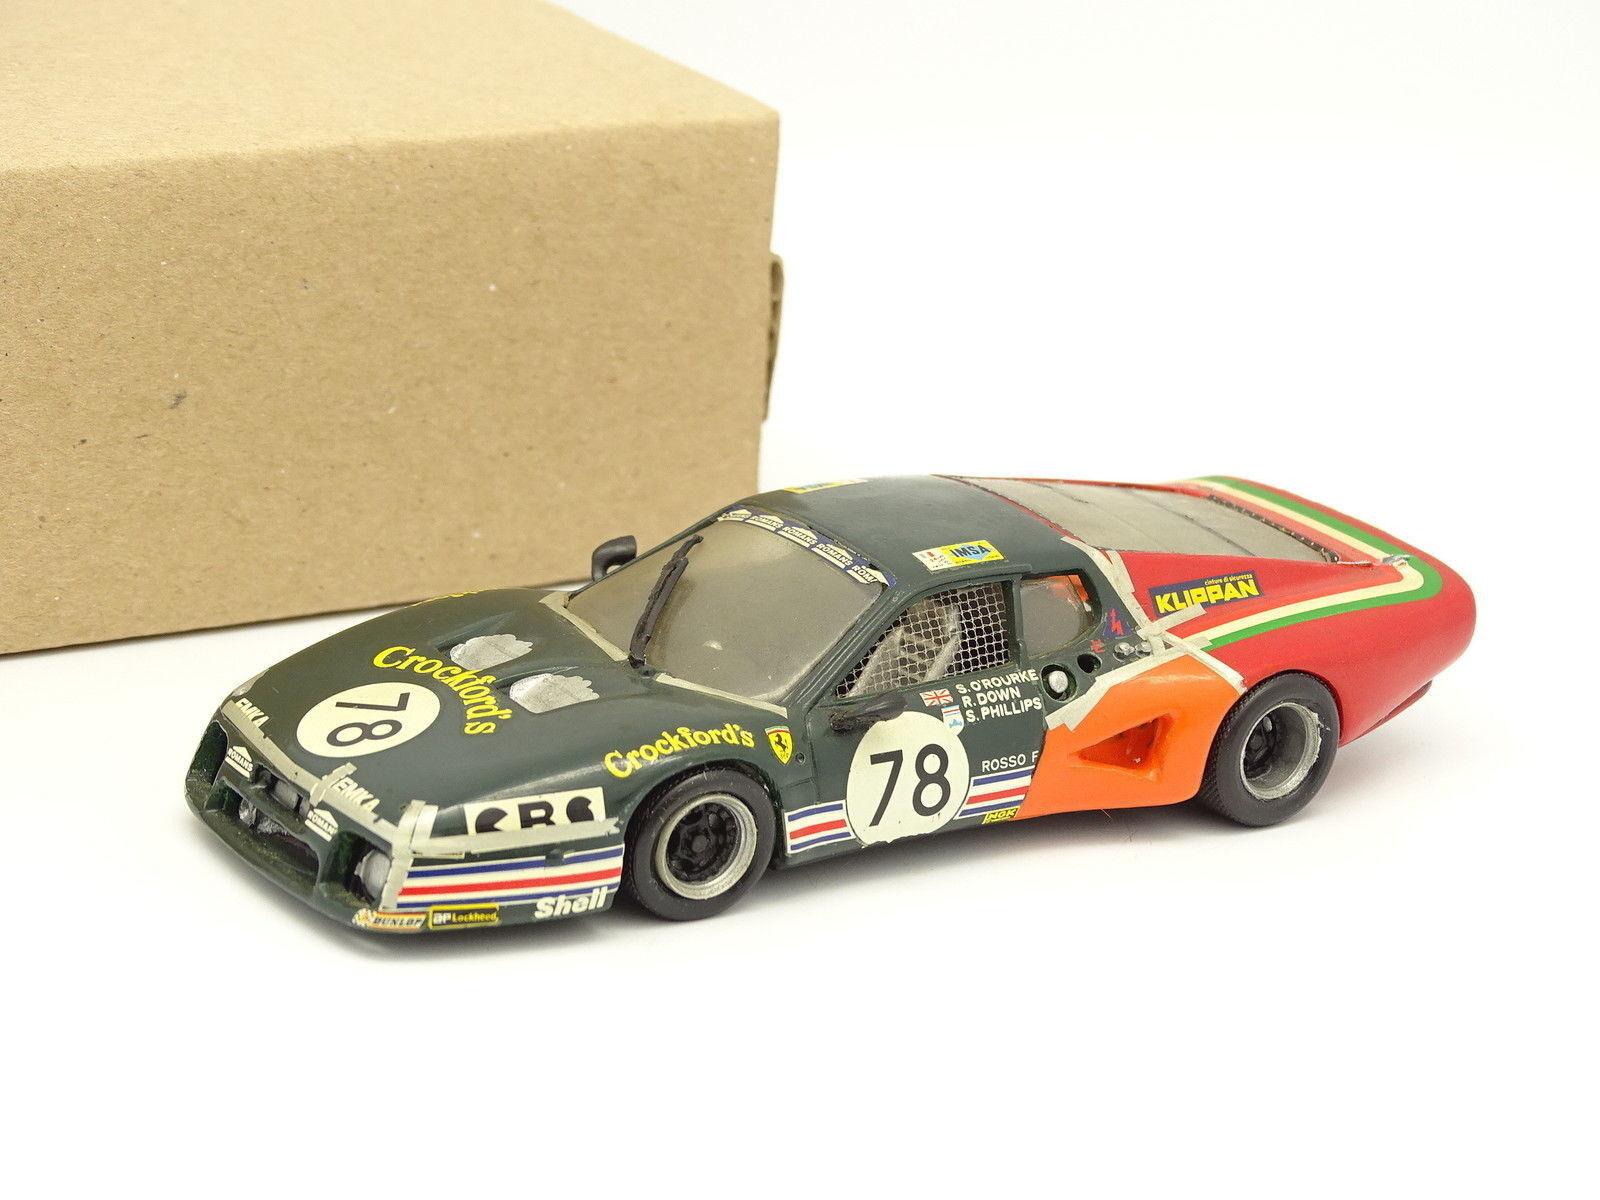 AMR Kit Montado Metal 1 43 - Ferrari 512 BB Le Mans 1980 de Crockford N°78